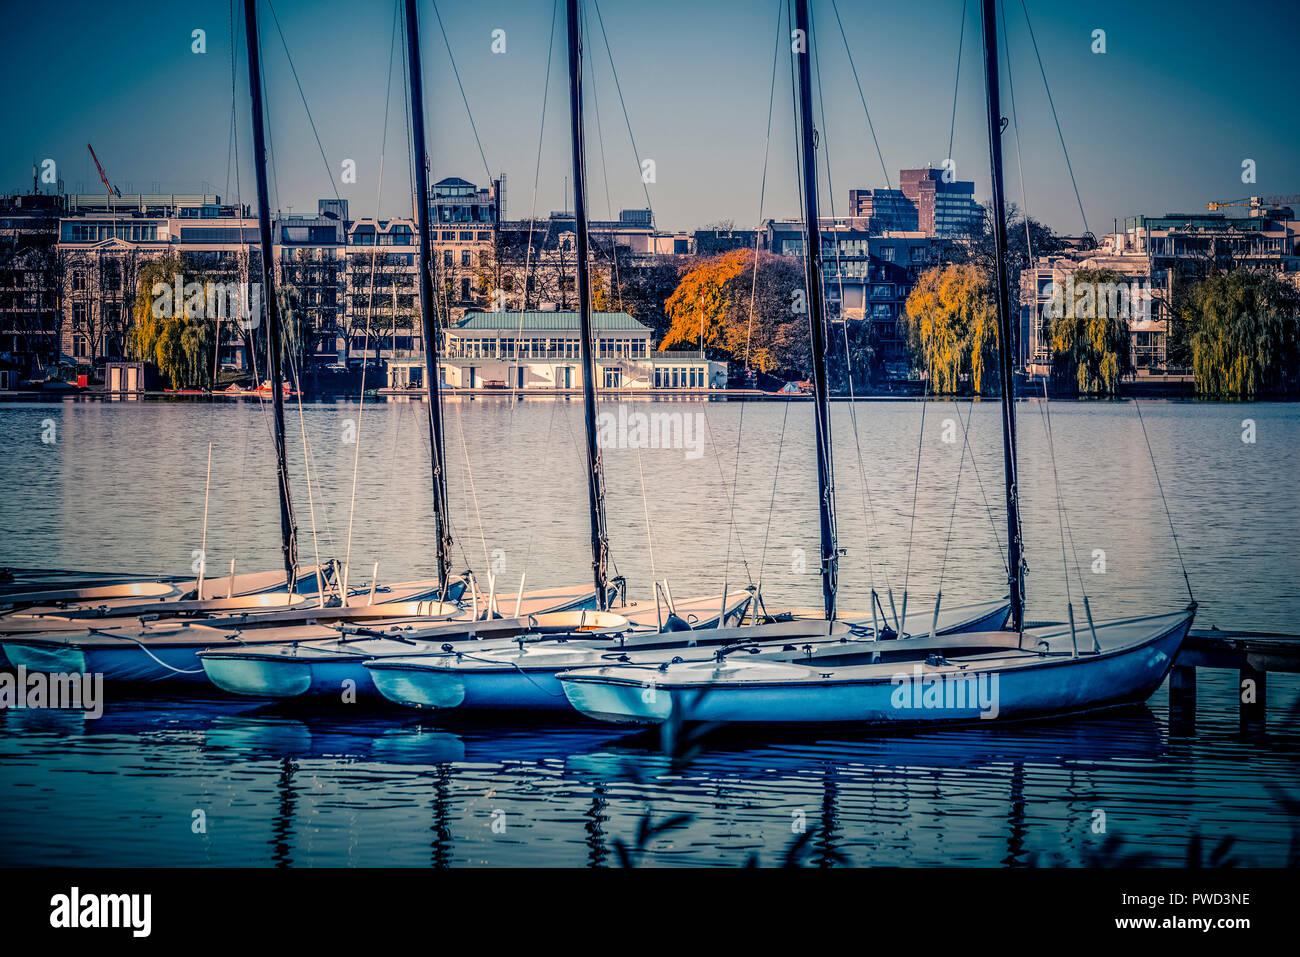 Deutschland, Hamburg, Alster, Aussenalster, Ruderclub, Germania, segeln, Segelboot - Stock Image